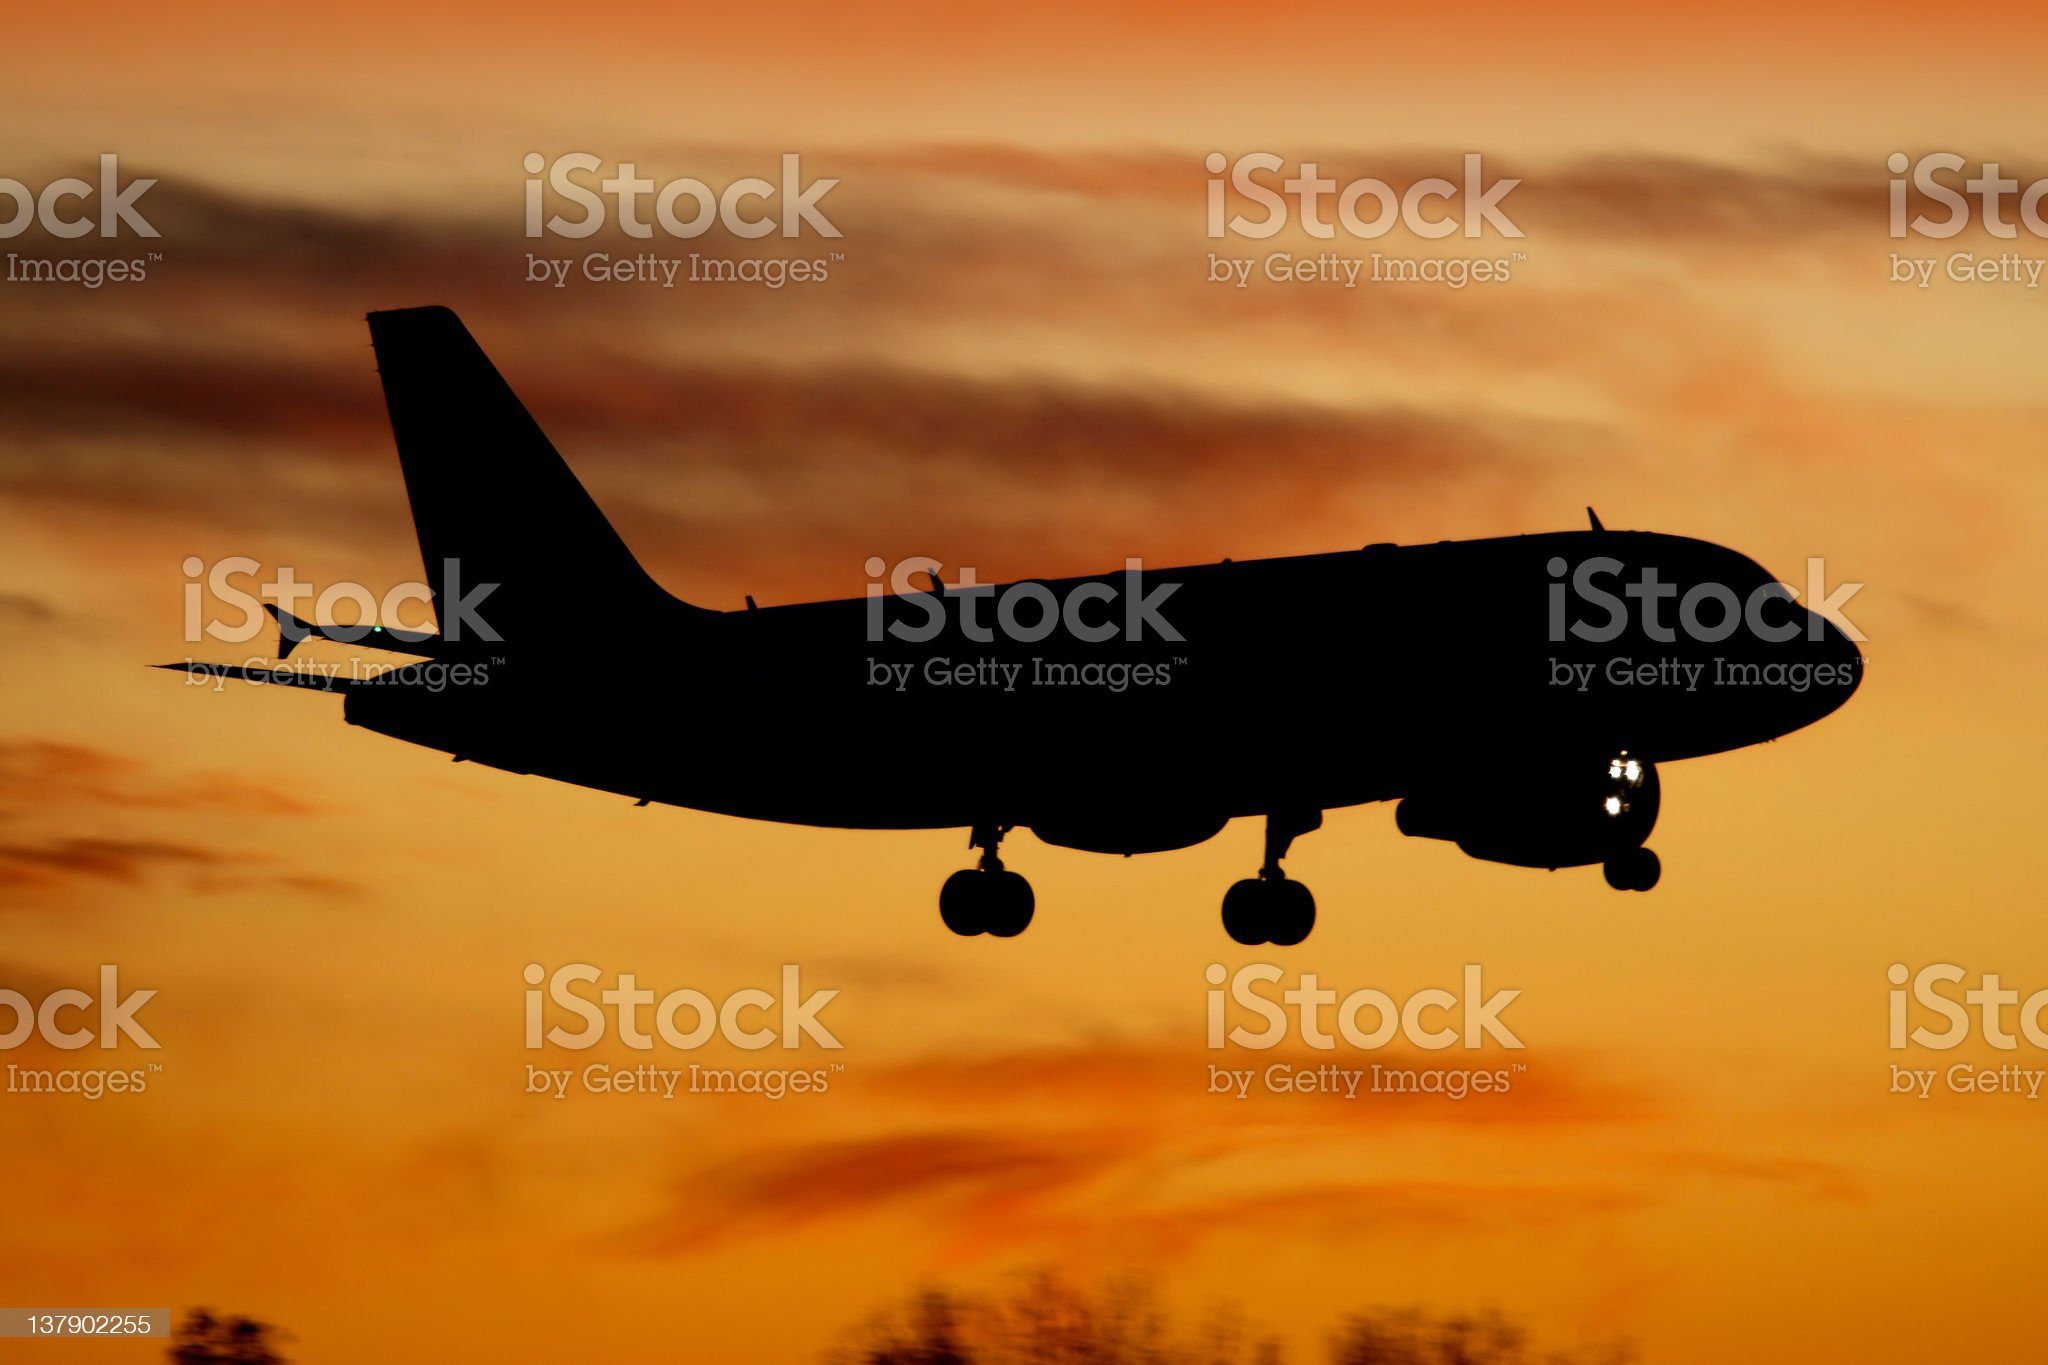 Aircraft landing at sunset royalty-free stock photo